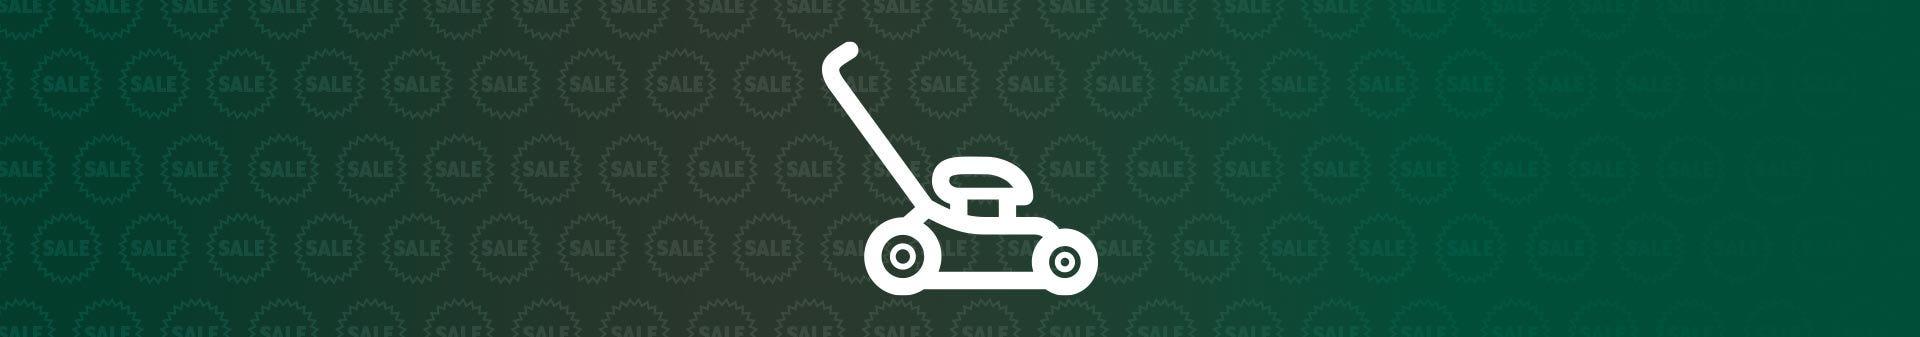 Sale - Lawnmowers